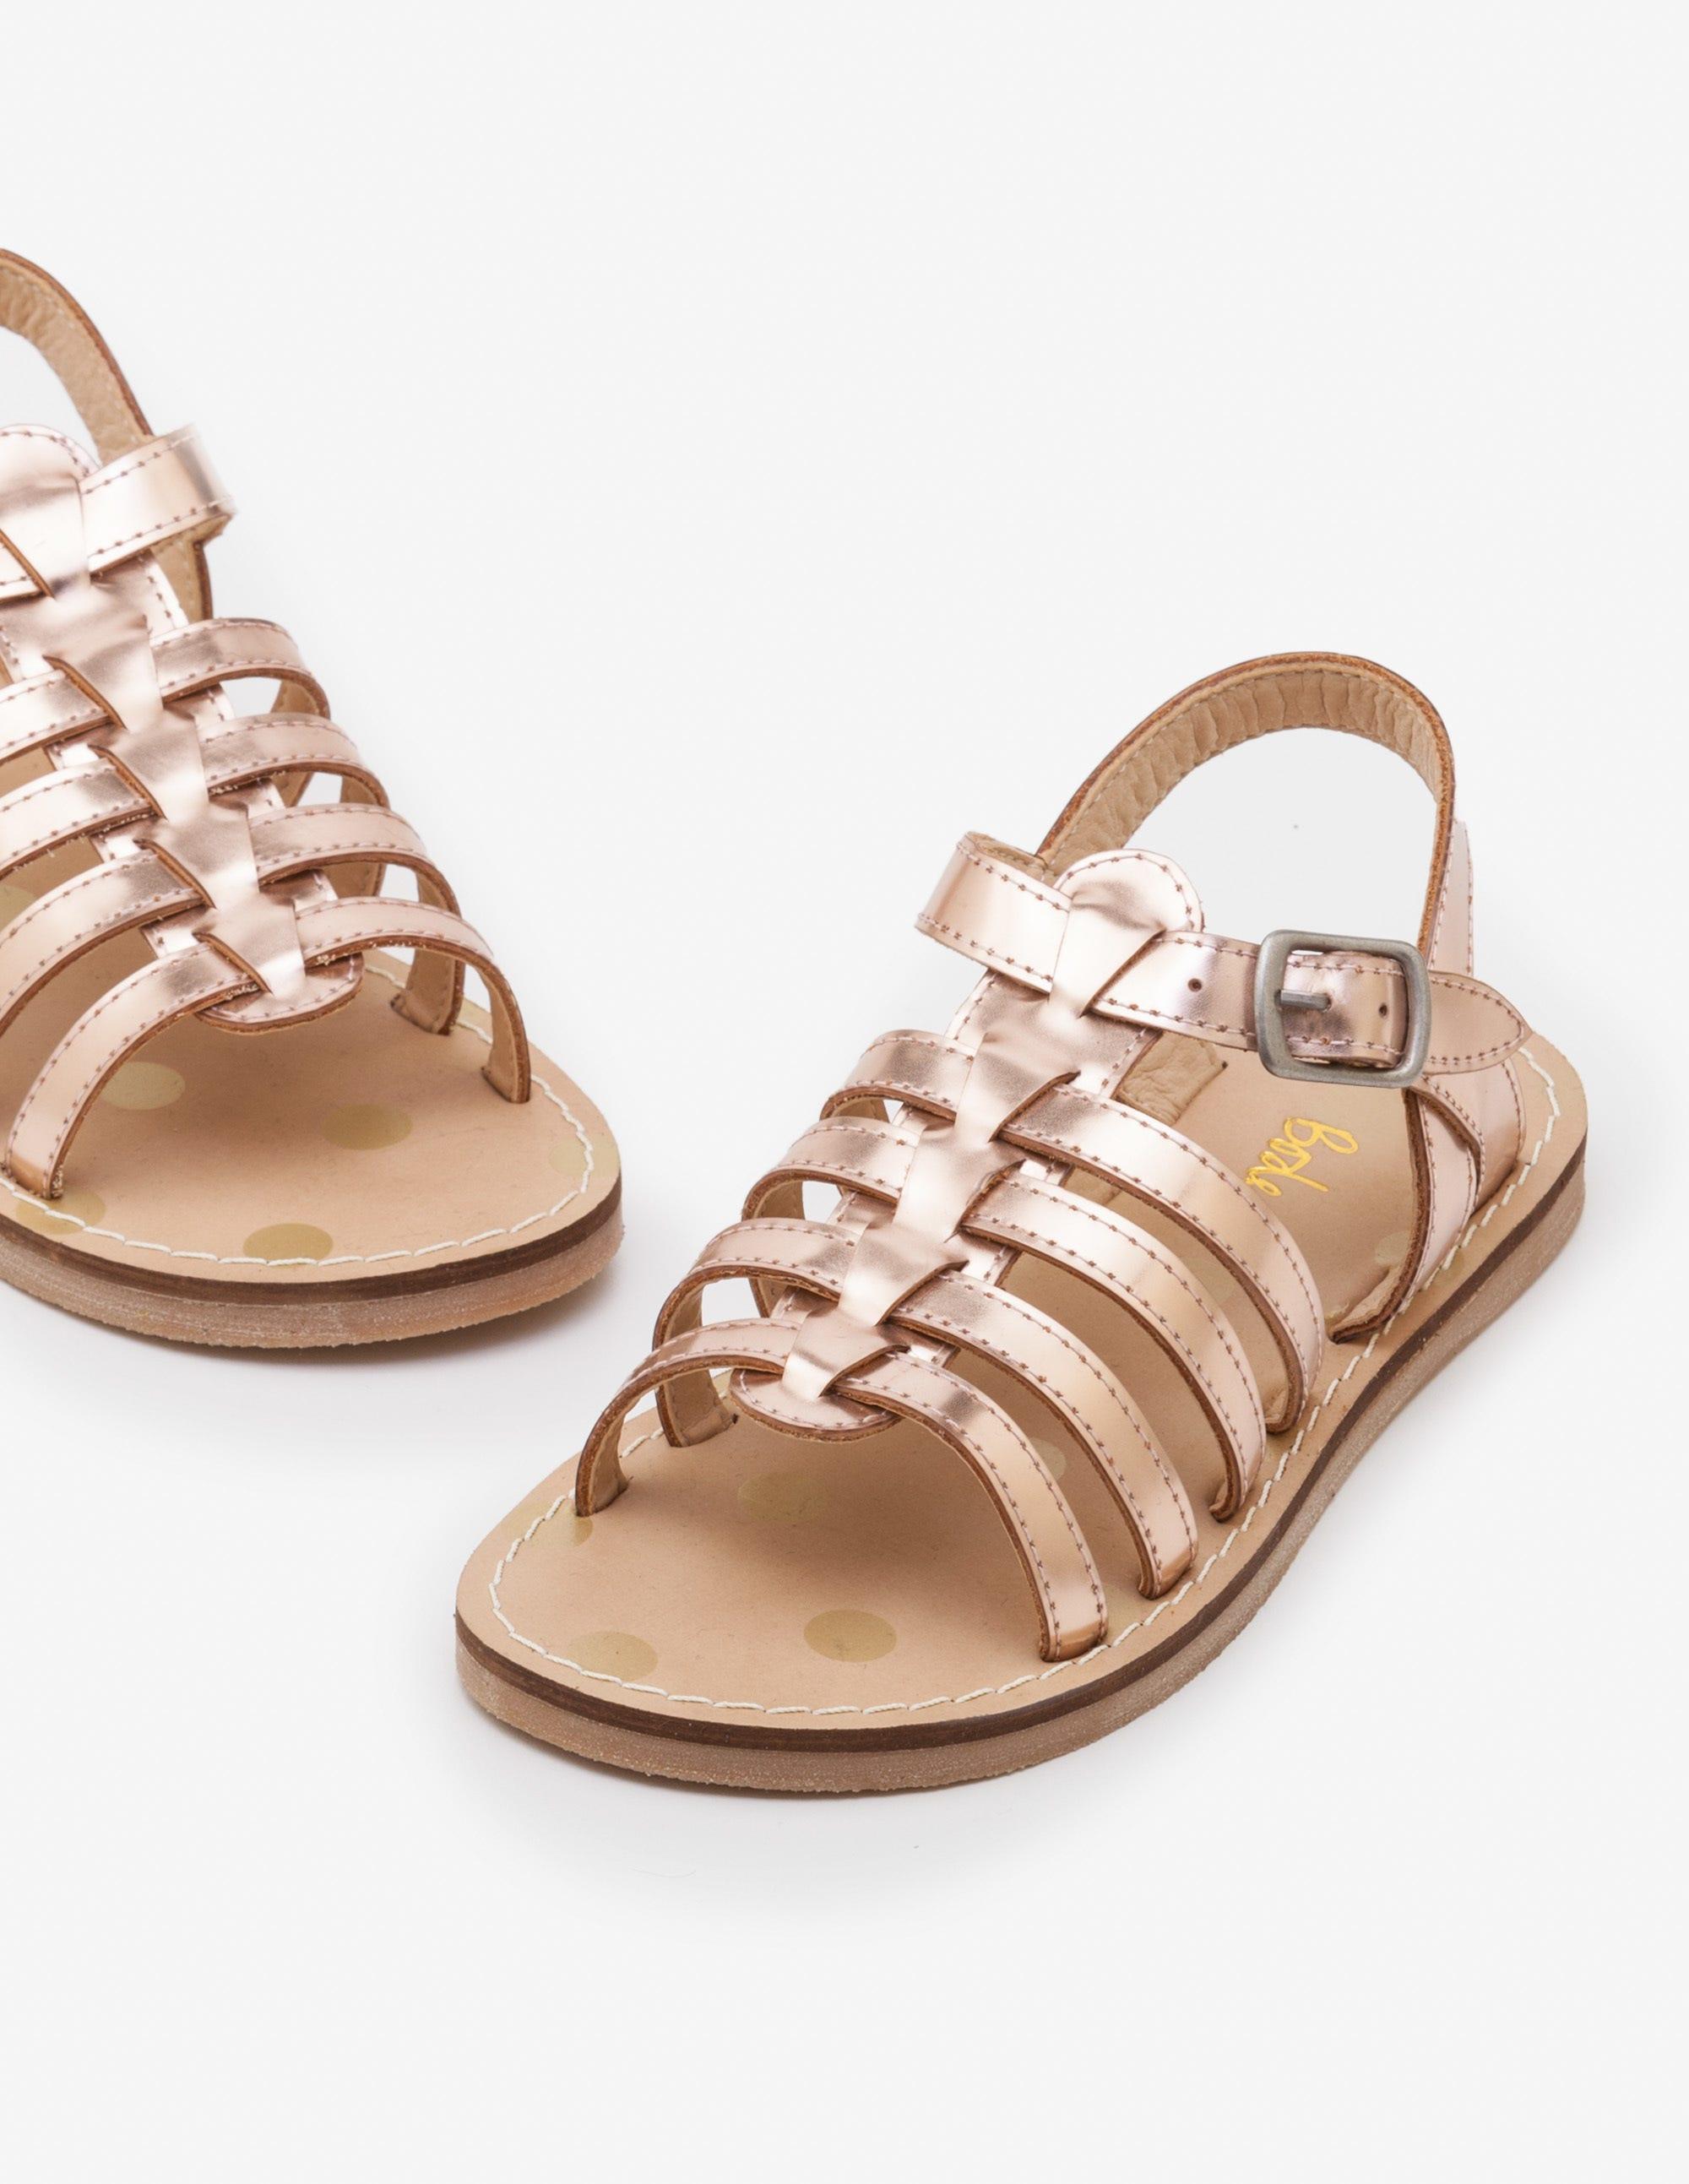 b2b4702d616b Leather Gladiator Sandals - Rose Gold Metallic